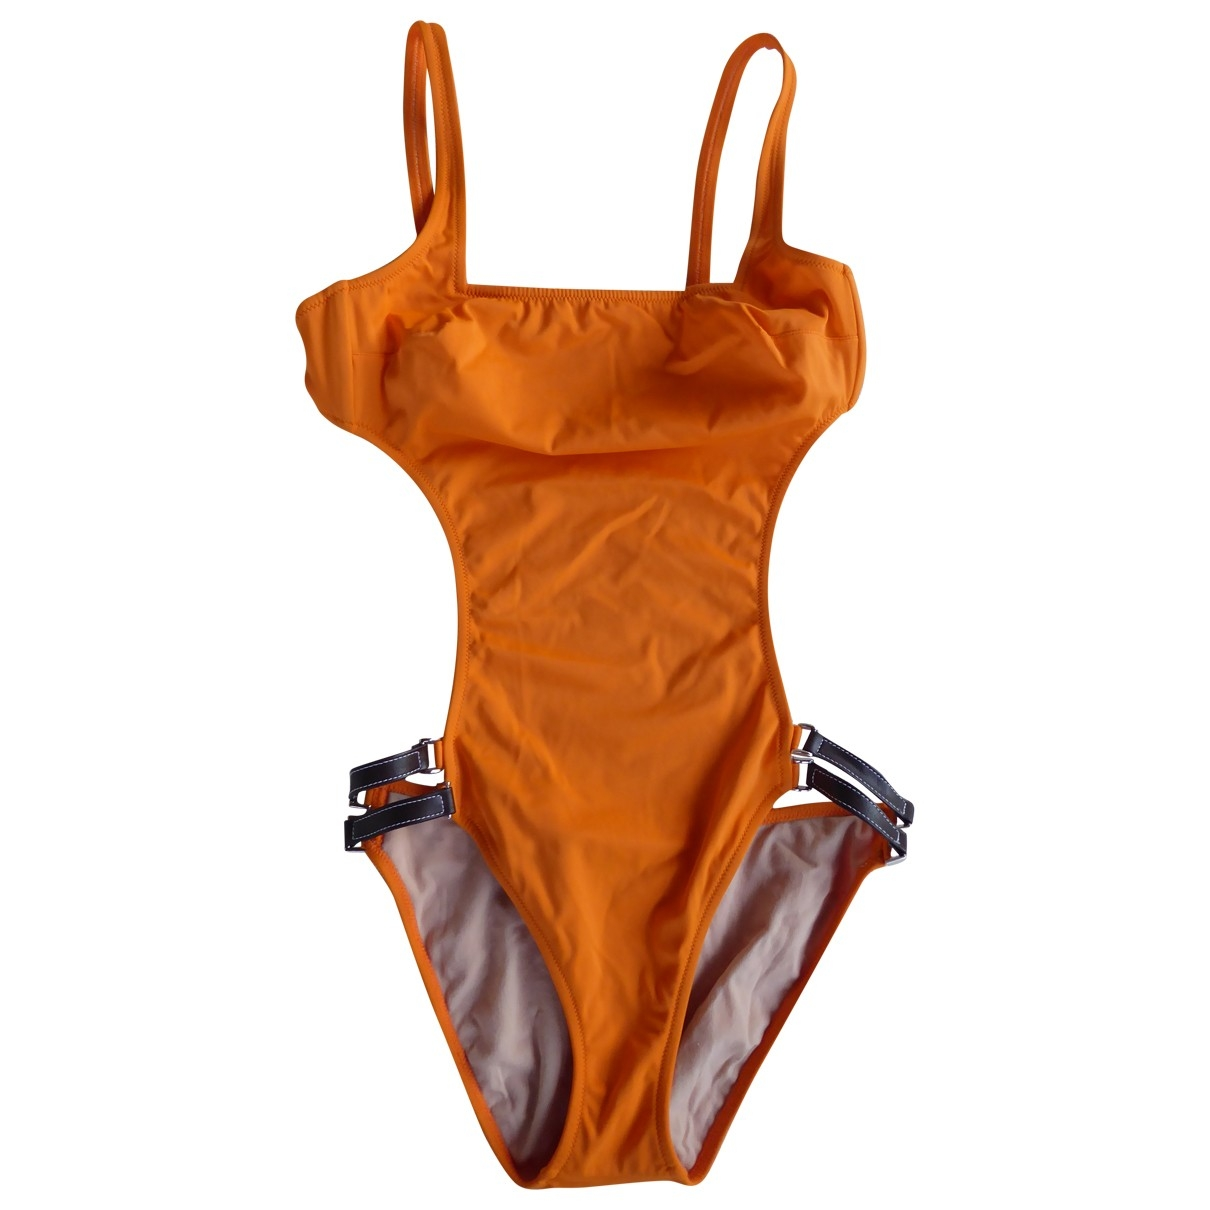 La Perla \N Badeanzug in  Orange Synthetik